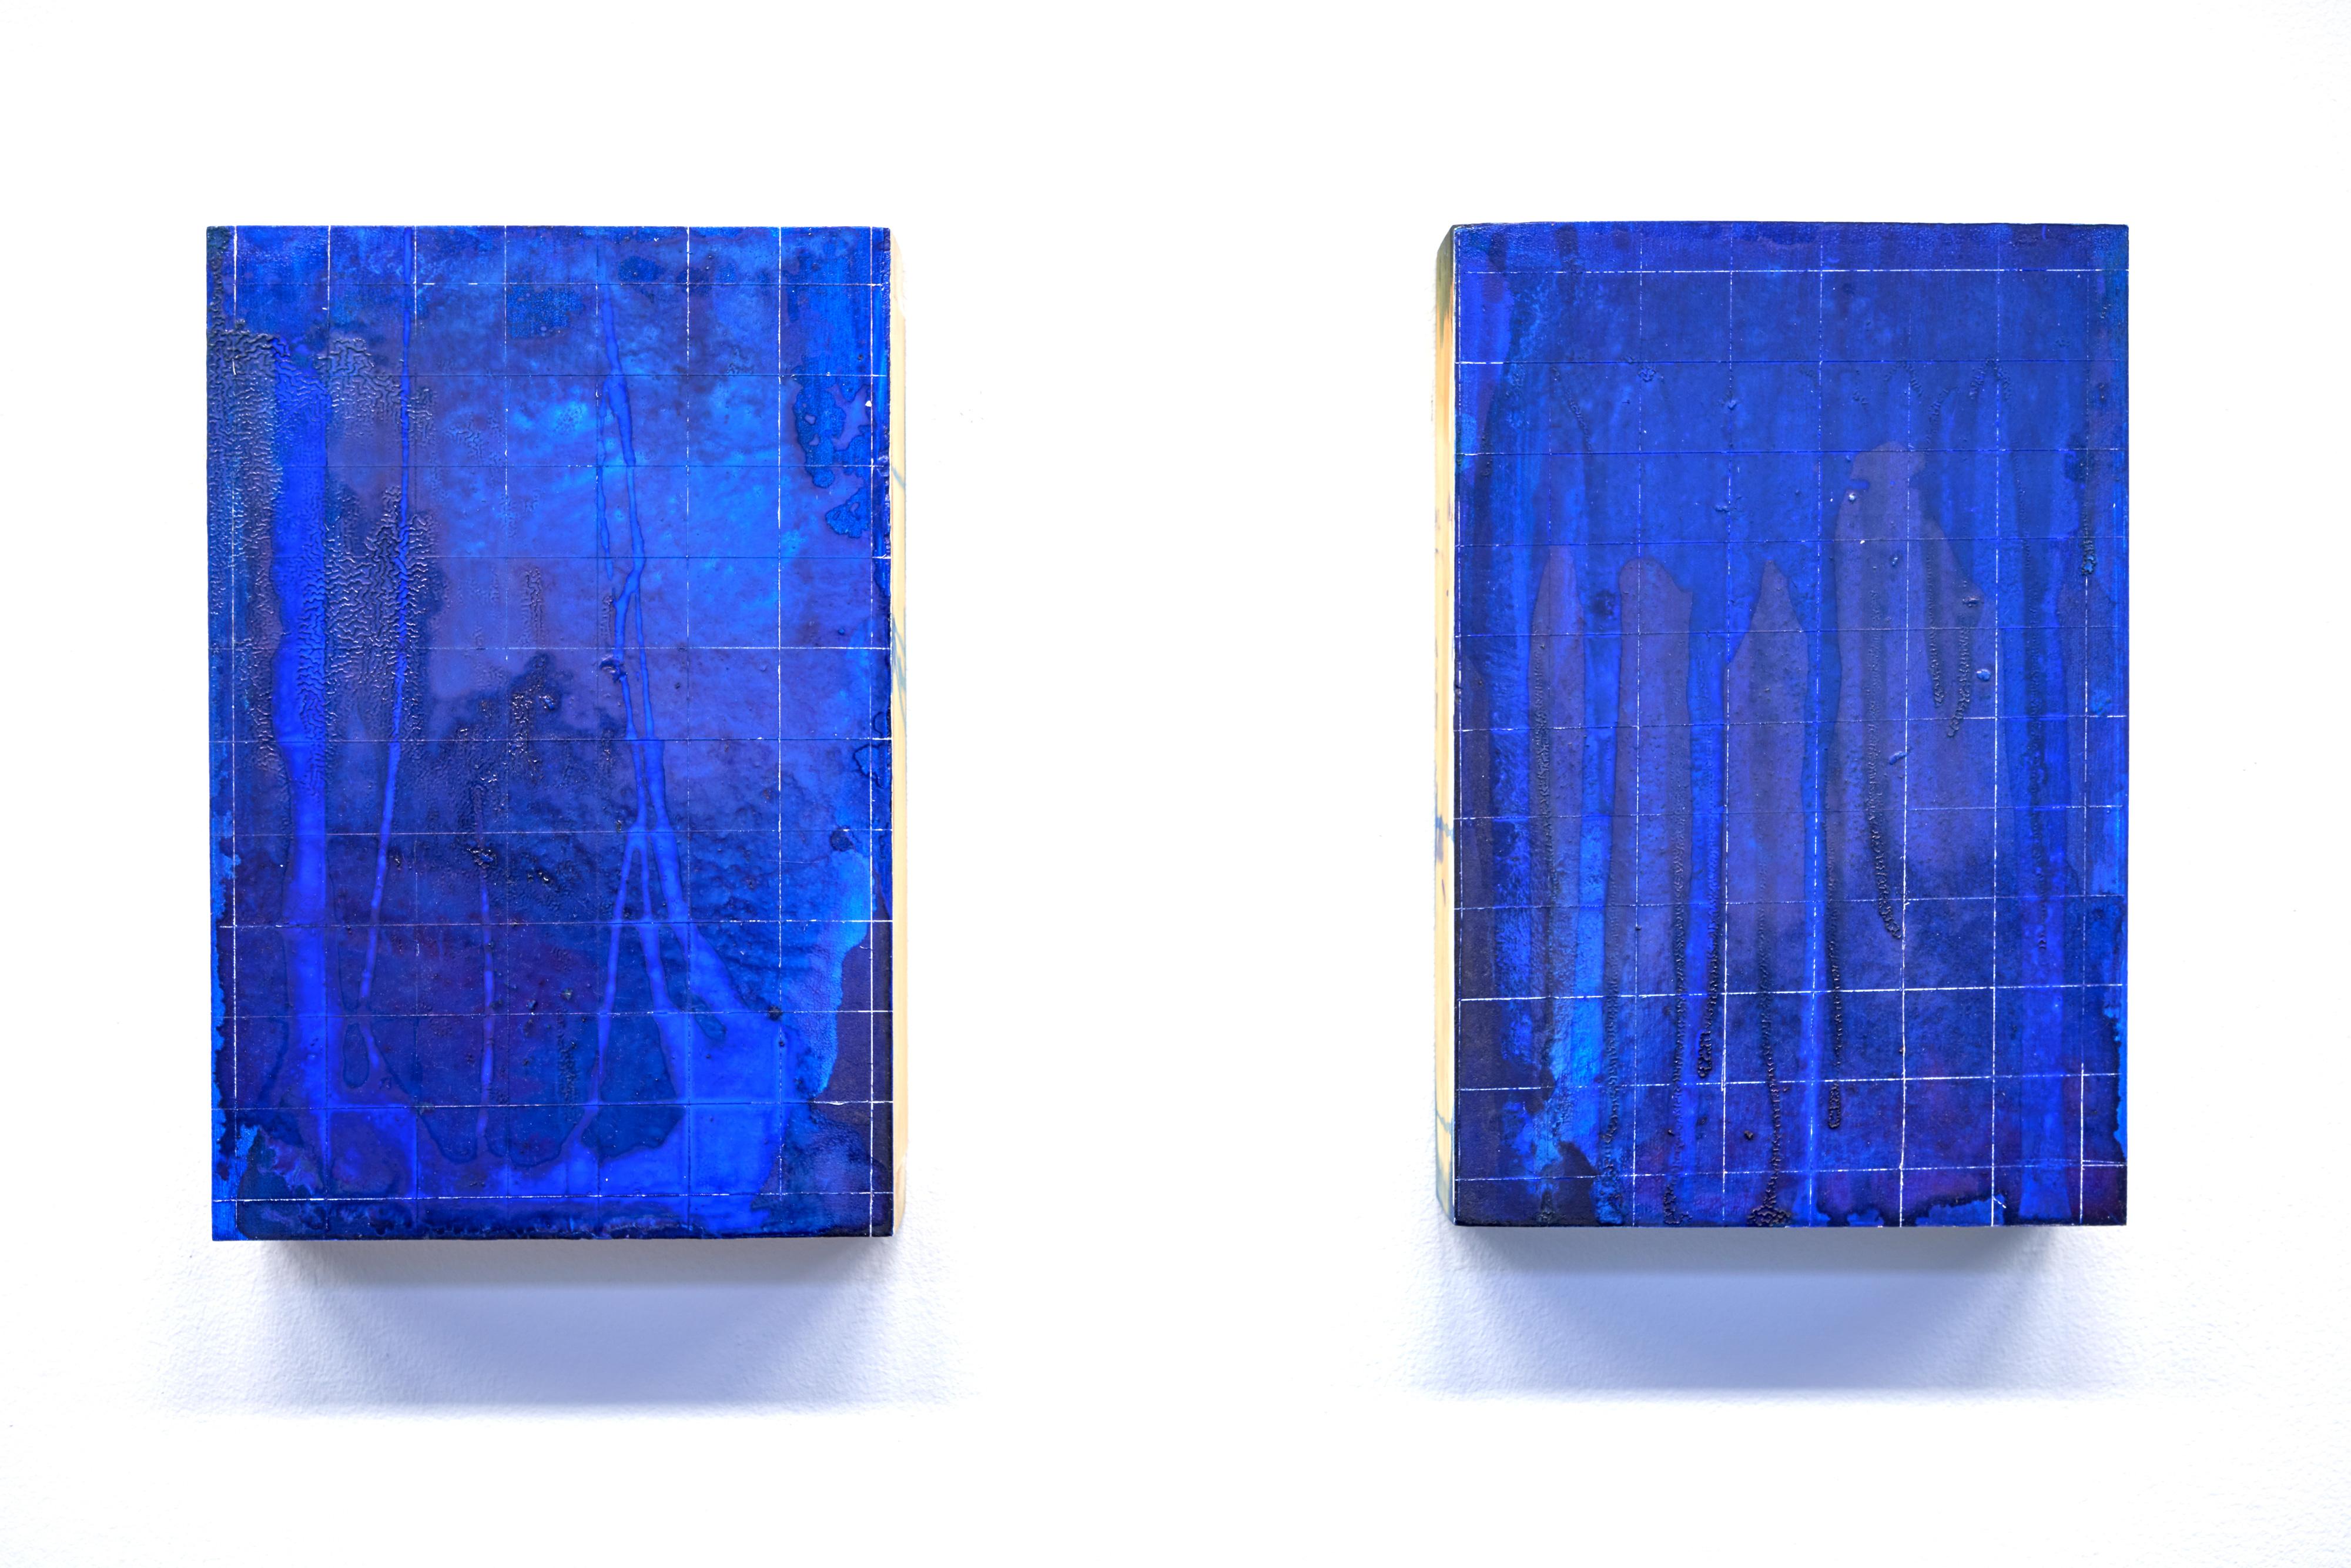 Galerie Barbara Thumm \ New Viewings #15 \ New Viewings #15